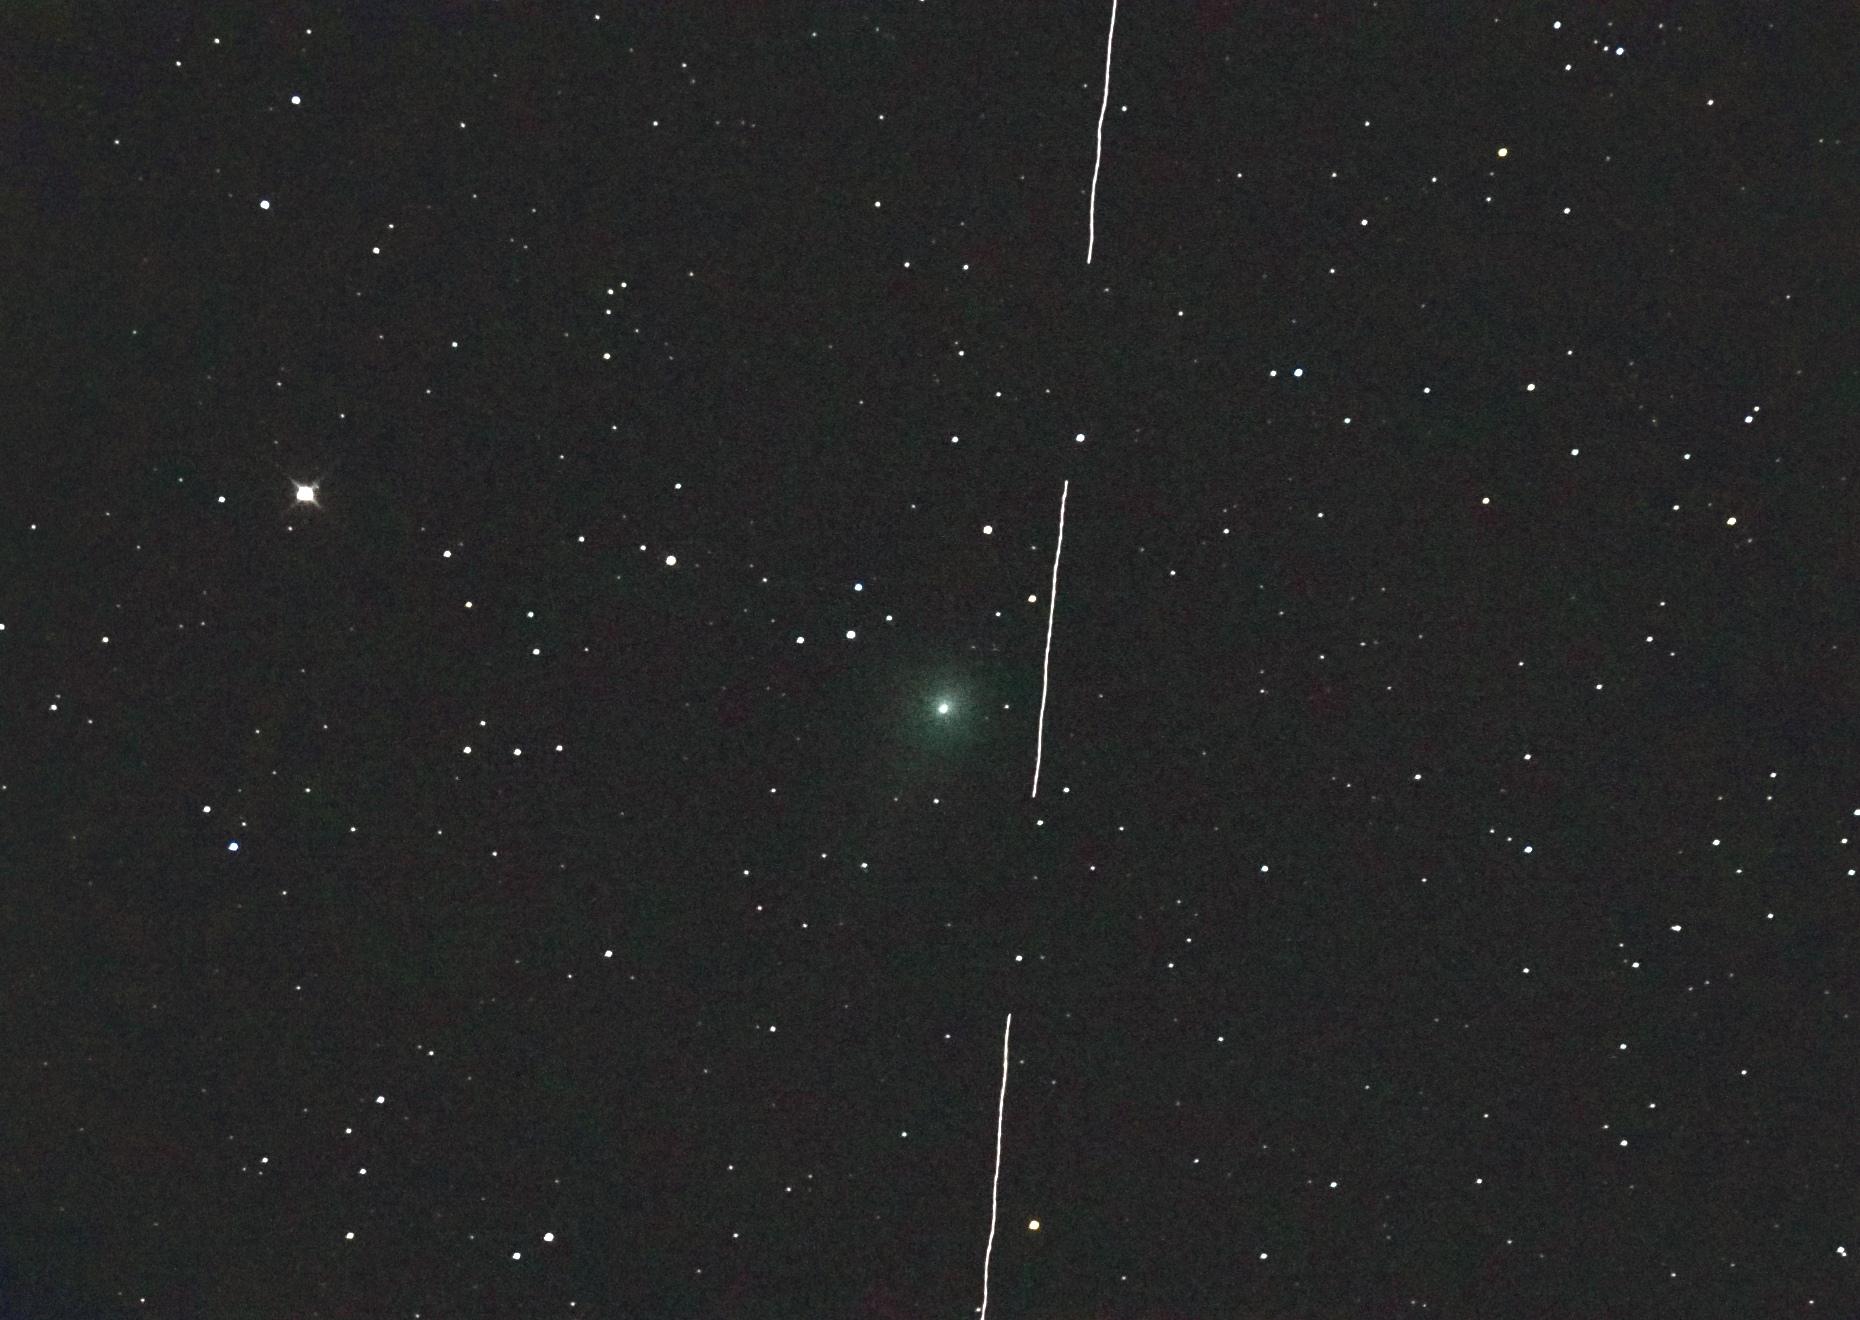 c2017t2-starlink-110520-22h31m16-t407f4b-3s.jpg.3433b13e806d8736be4a19f69ef168b4.jpg